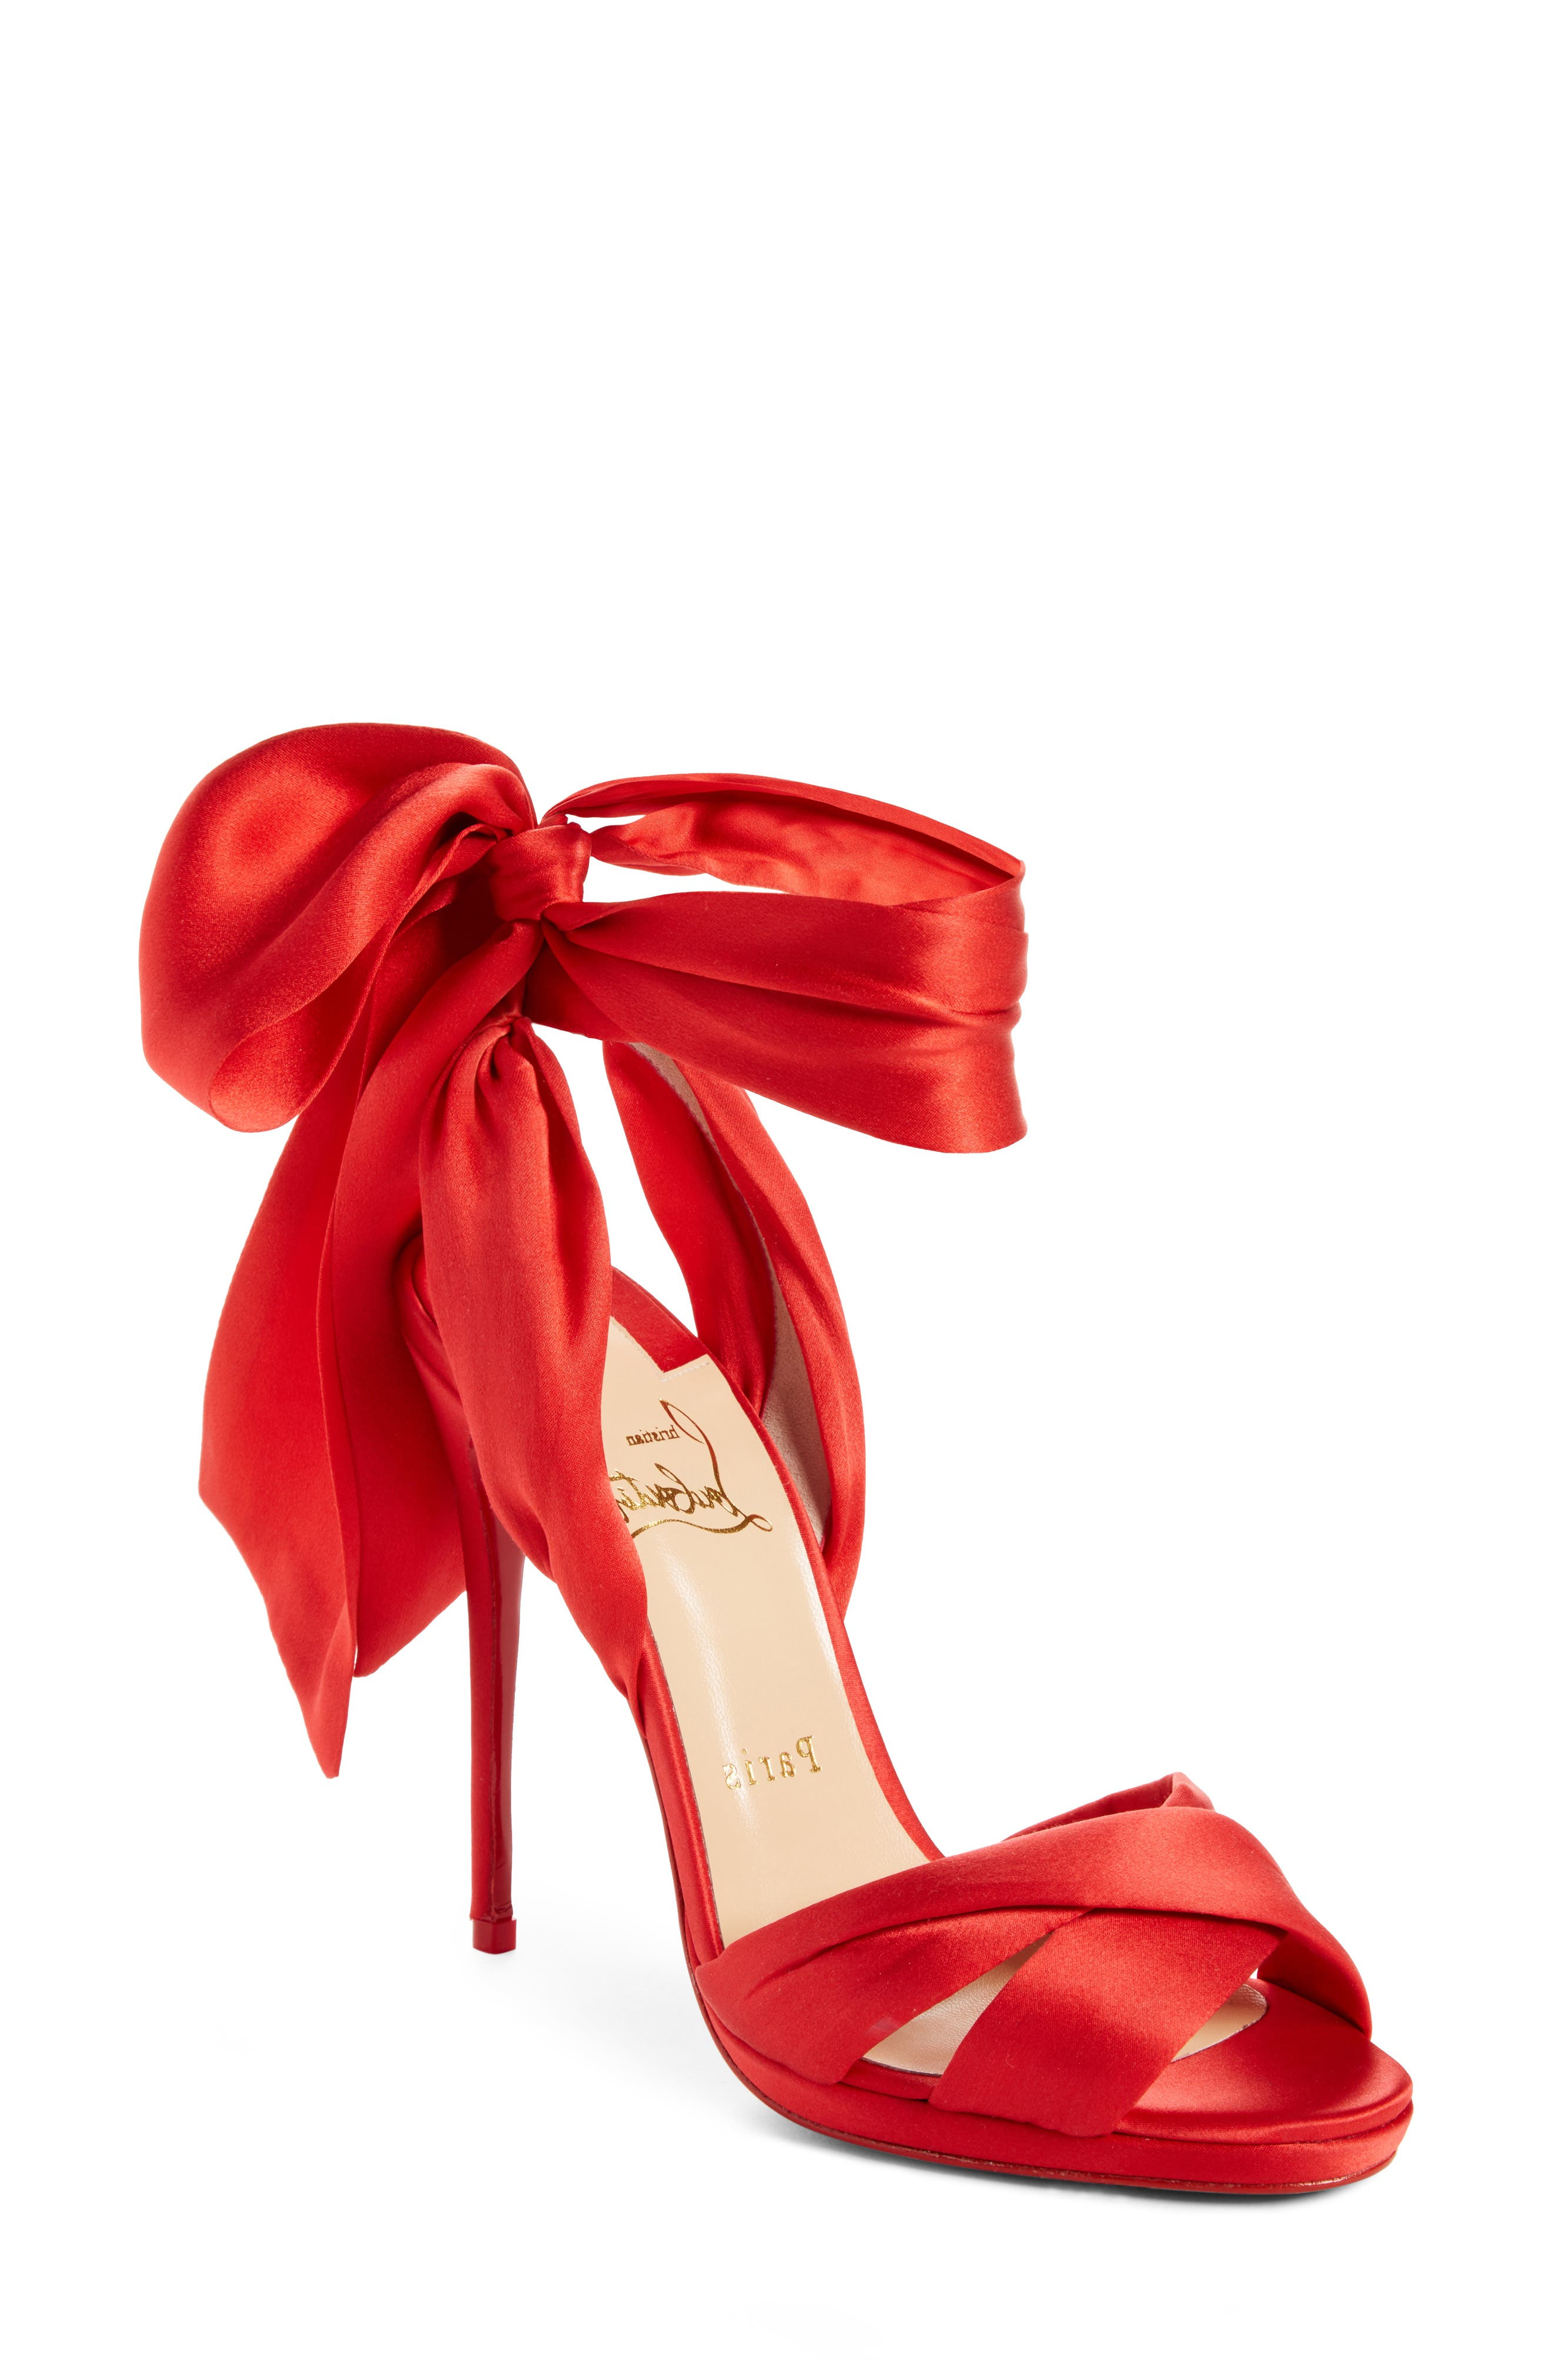 Red High Heel Shoes For Women Heels Zone